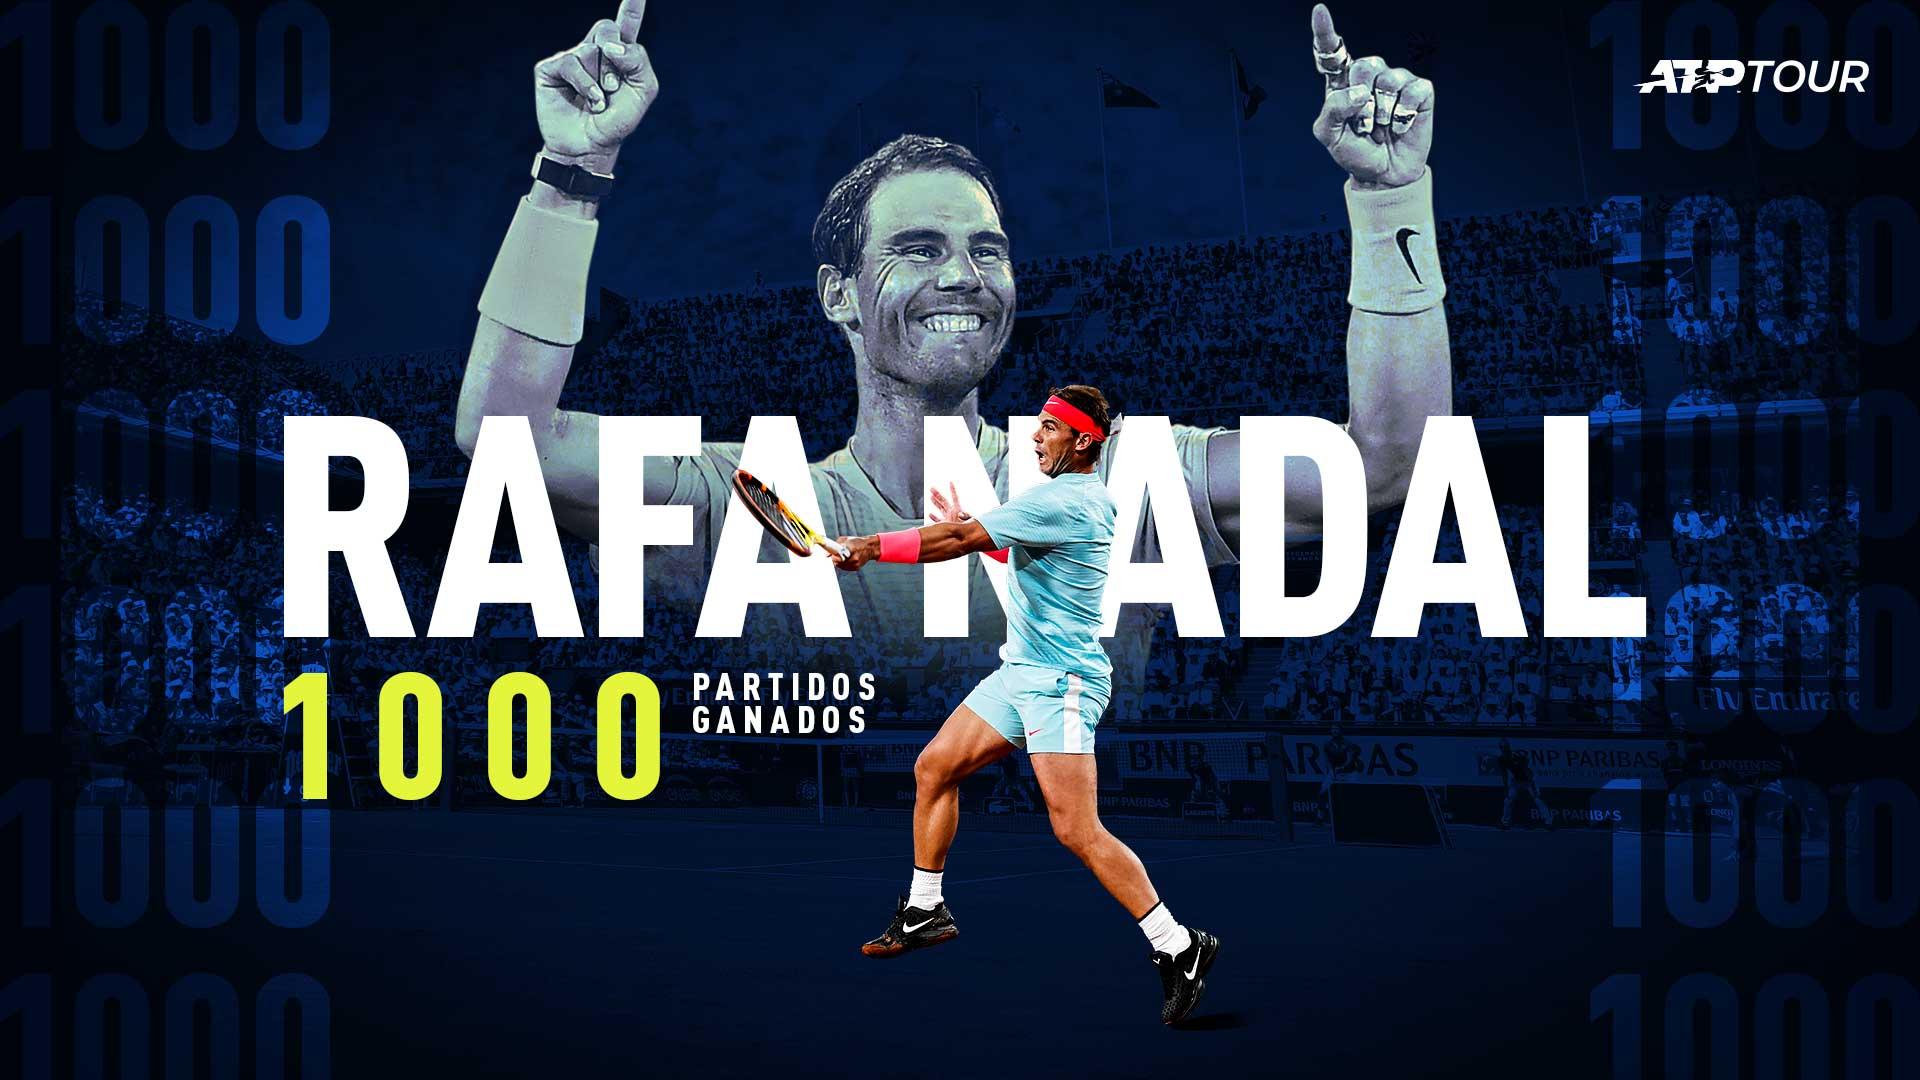 ¡Histórico! Rafa Nadal llega a las 1000 victorias